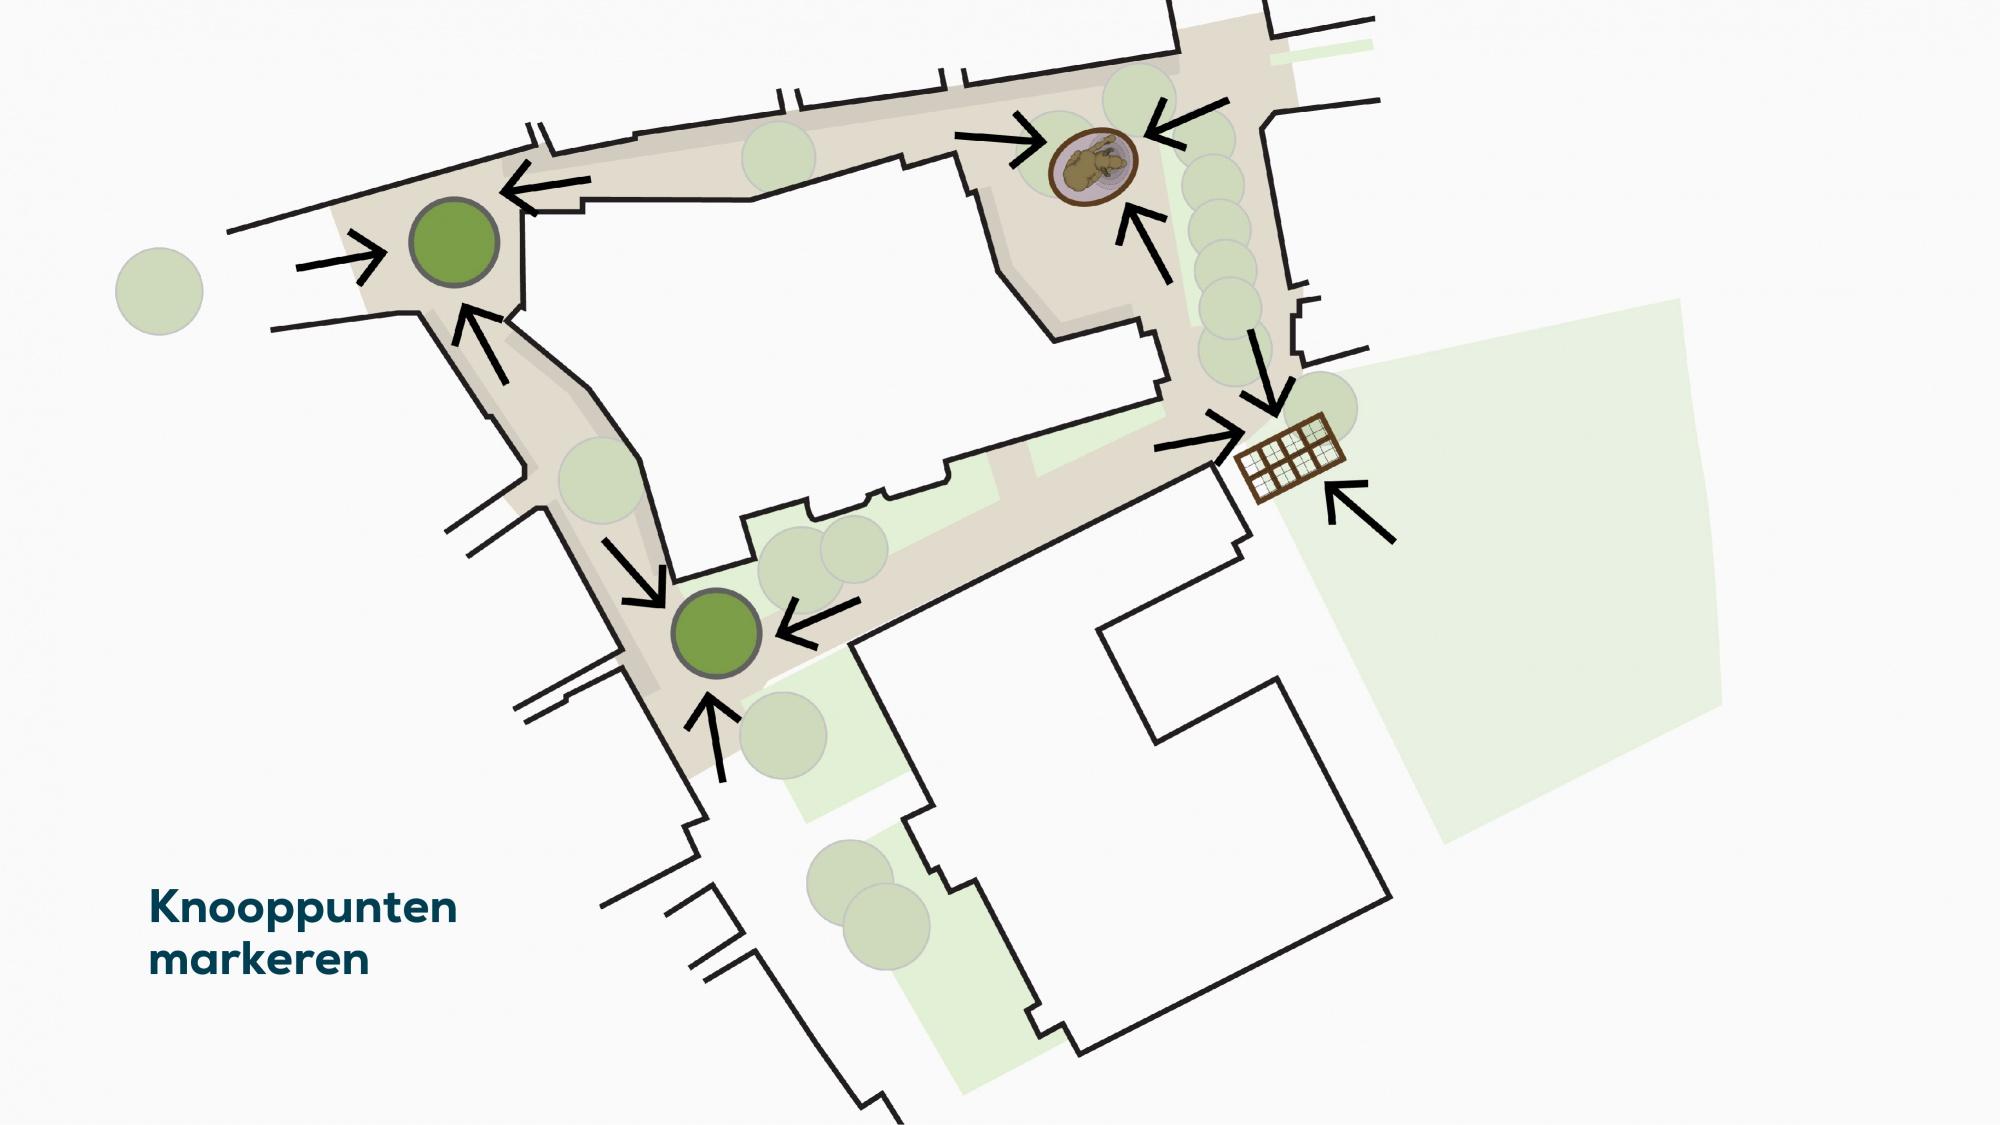 plattegrond 1 knooppunten markeren